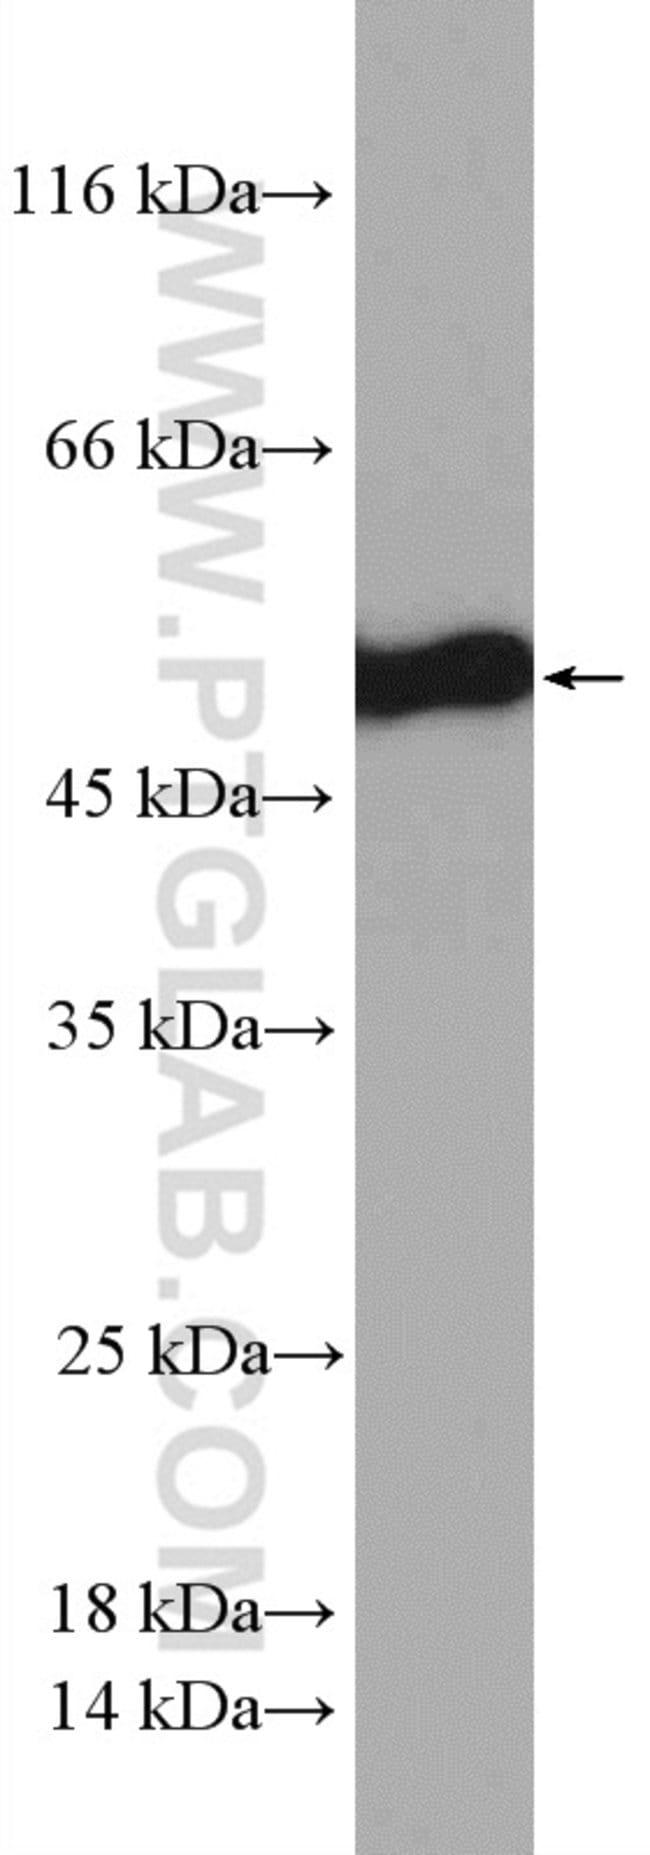 STAMBPL1 Rabbit anti-Human, Polyclonal, Proteintech 150 μL; Unconjugated Ver productos